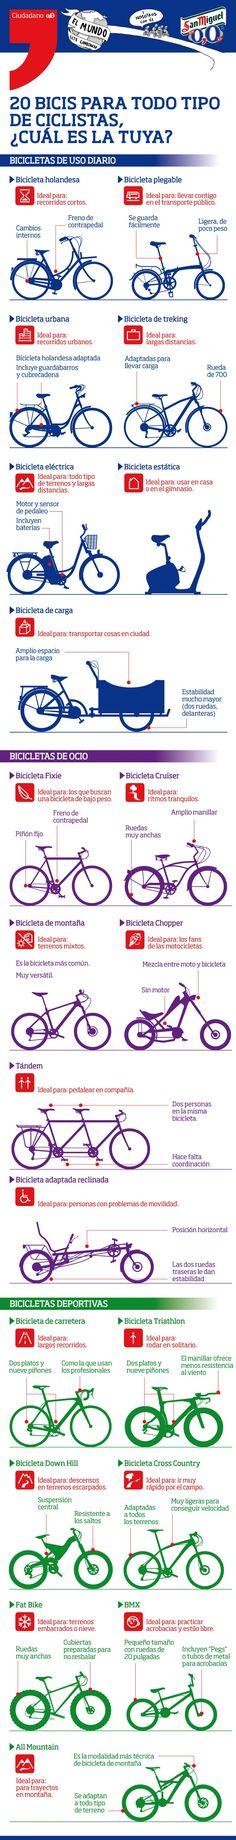 Tipos de bicicletas